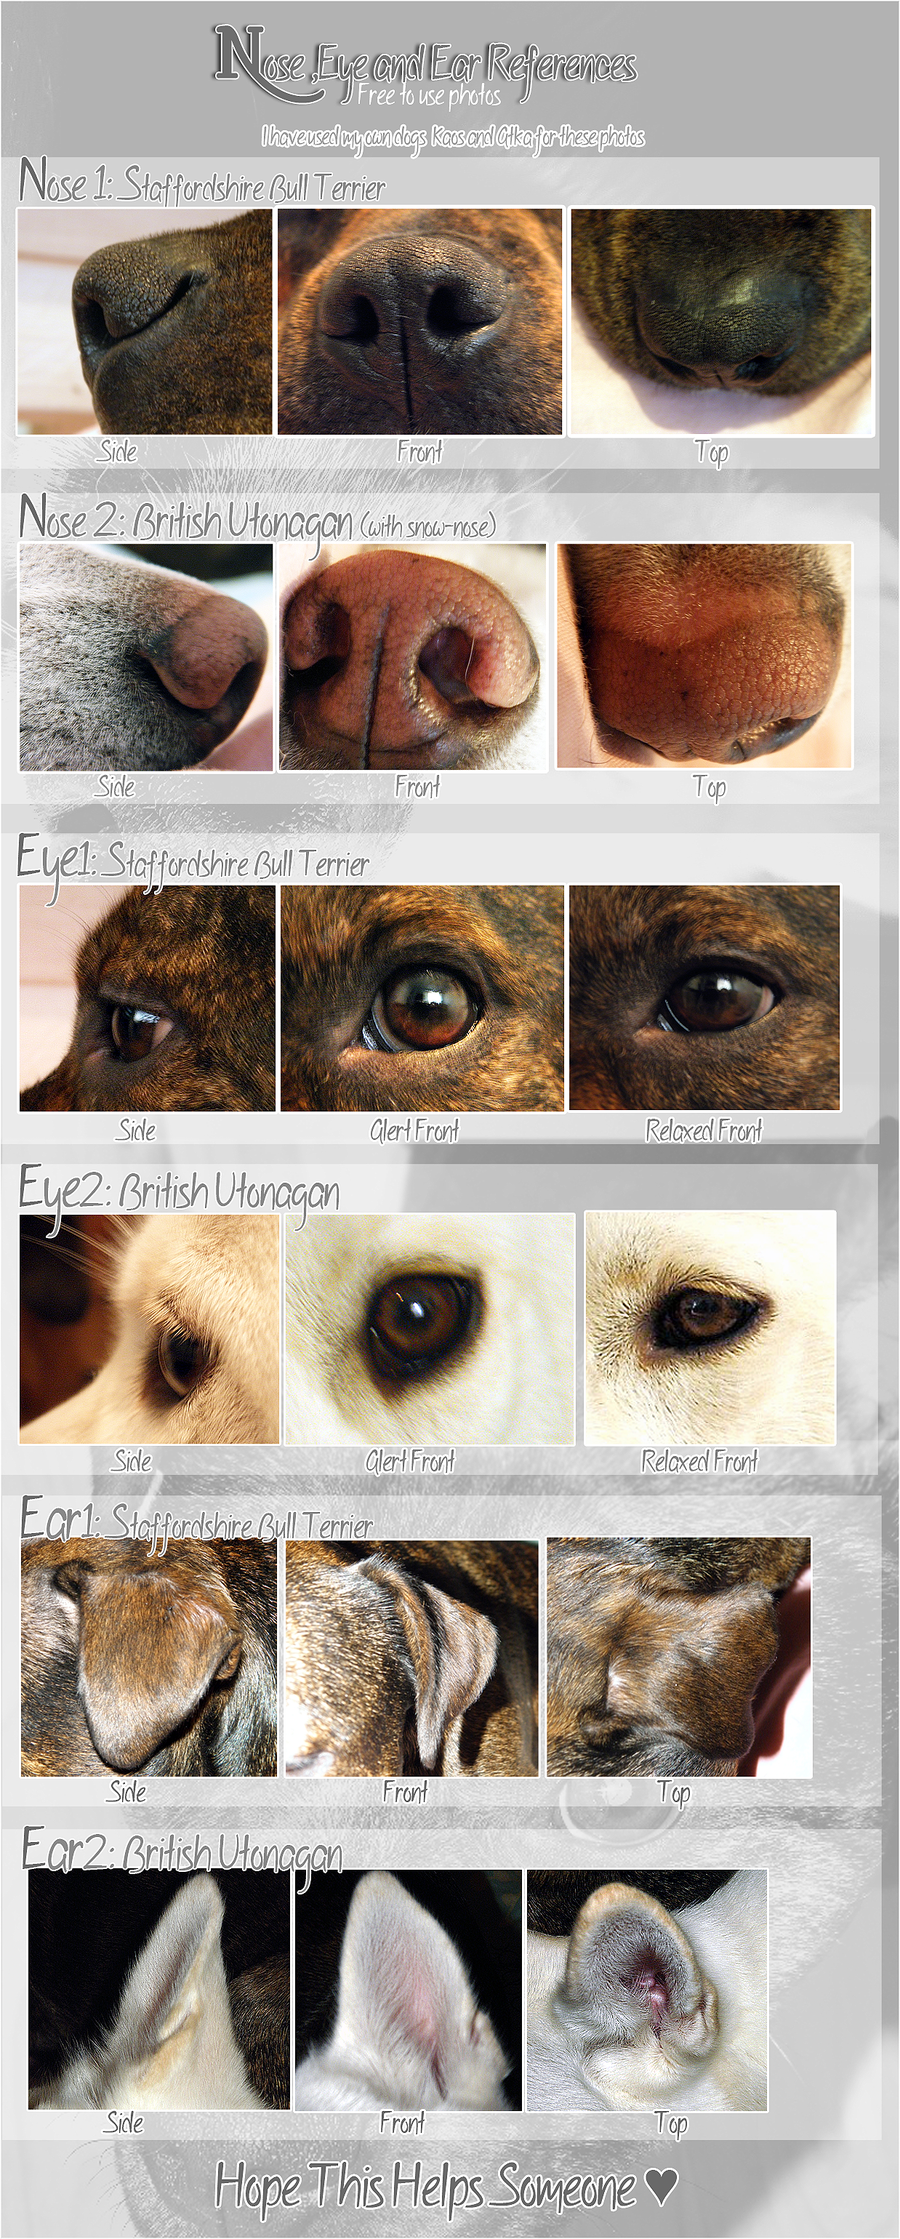 Fursuit Help - Nose ,eyes,ears | Art | Pinterest | Fursuit, Animal ...